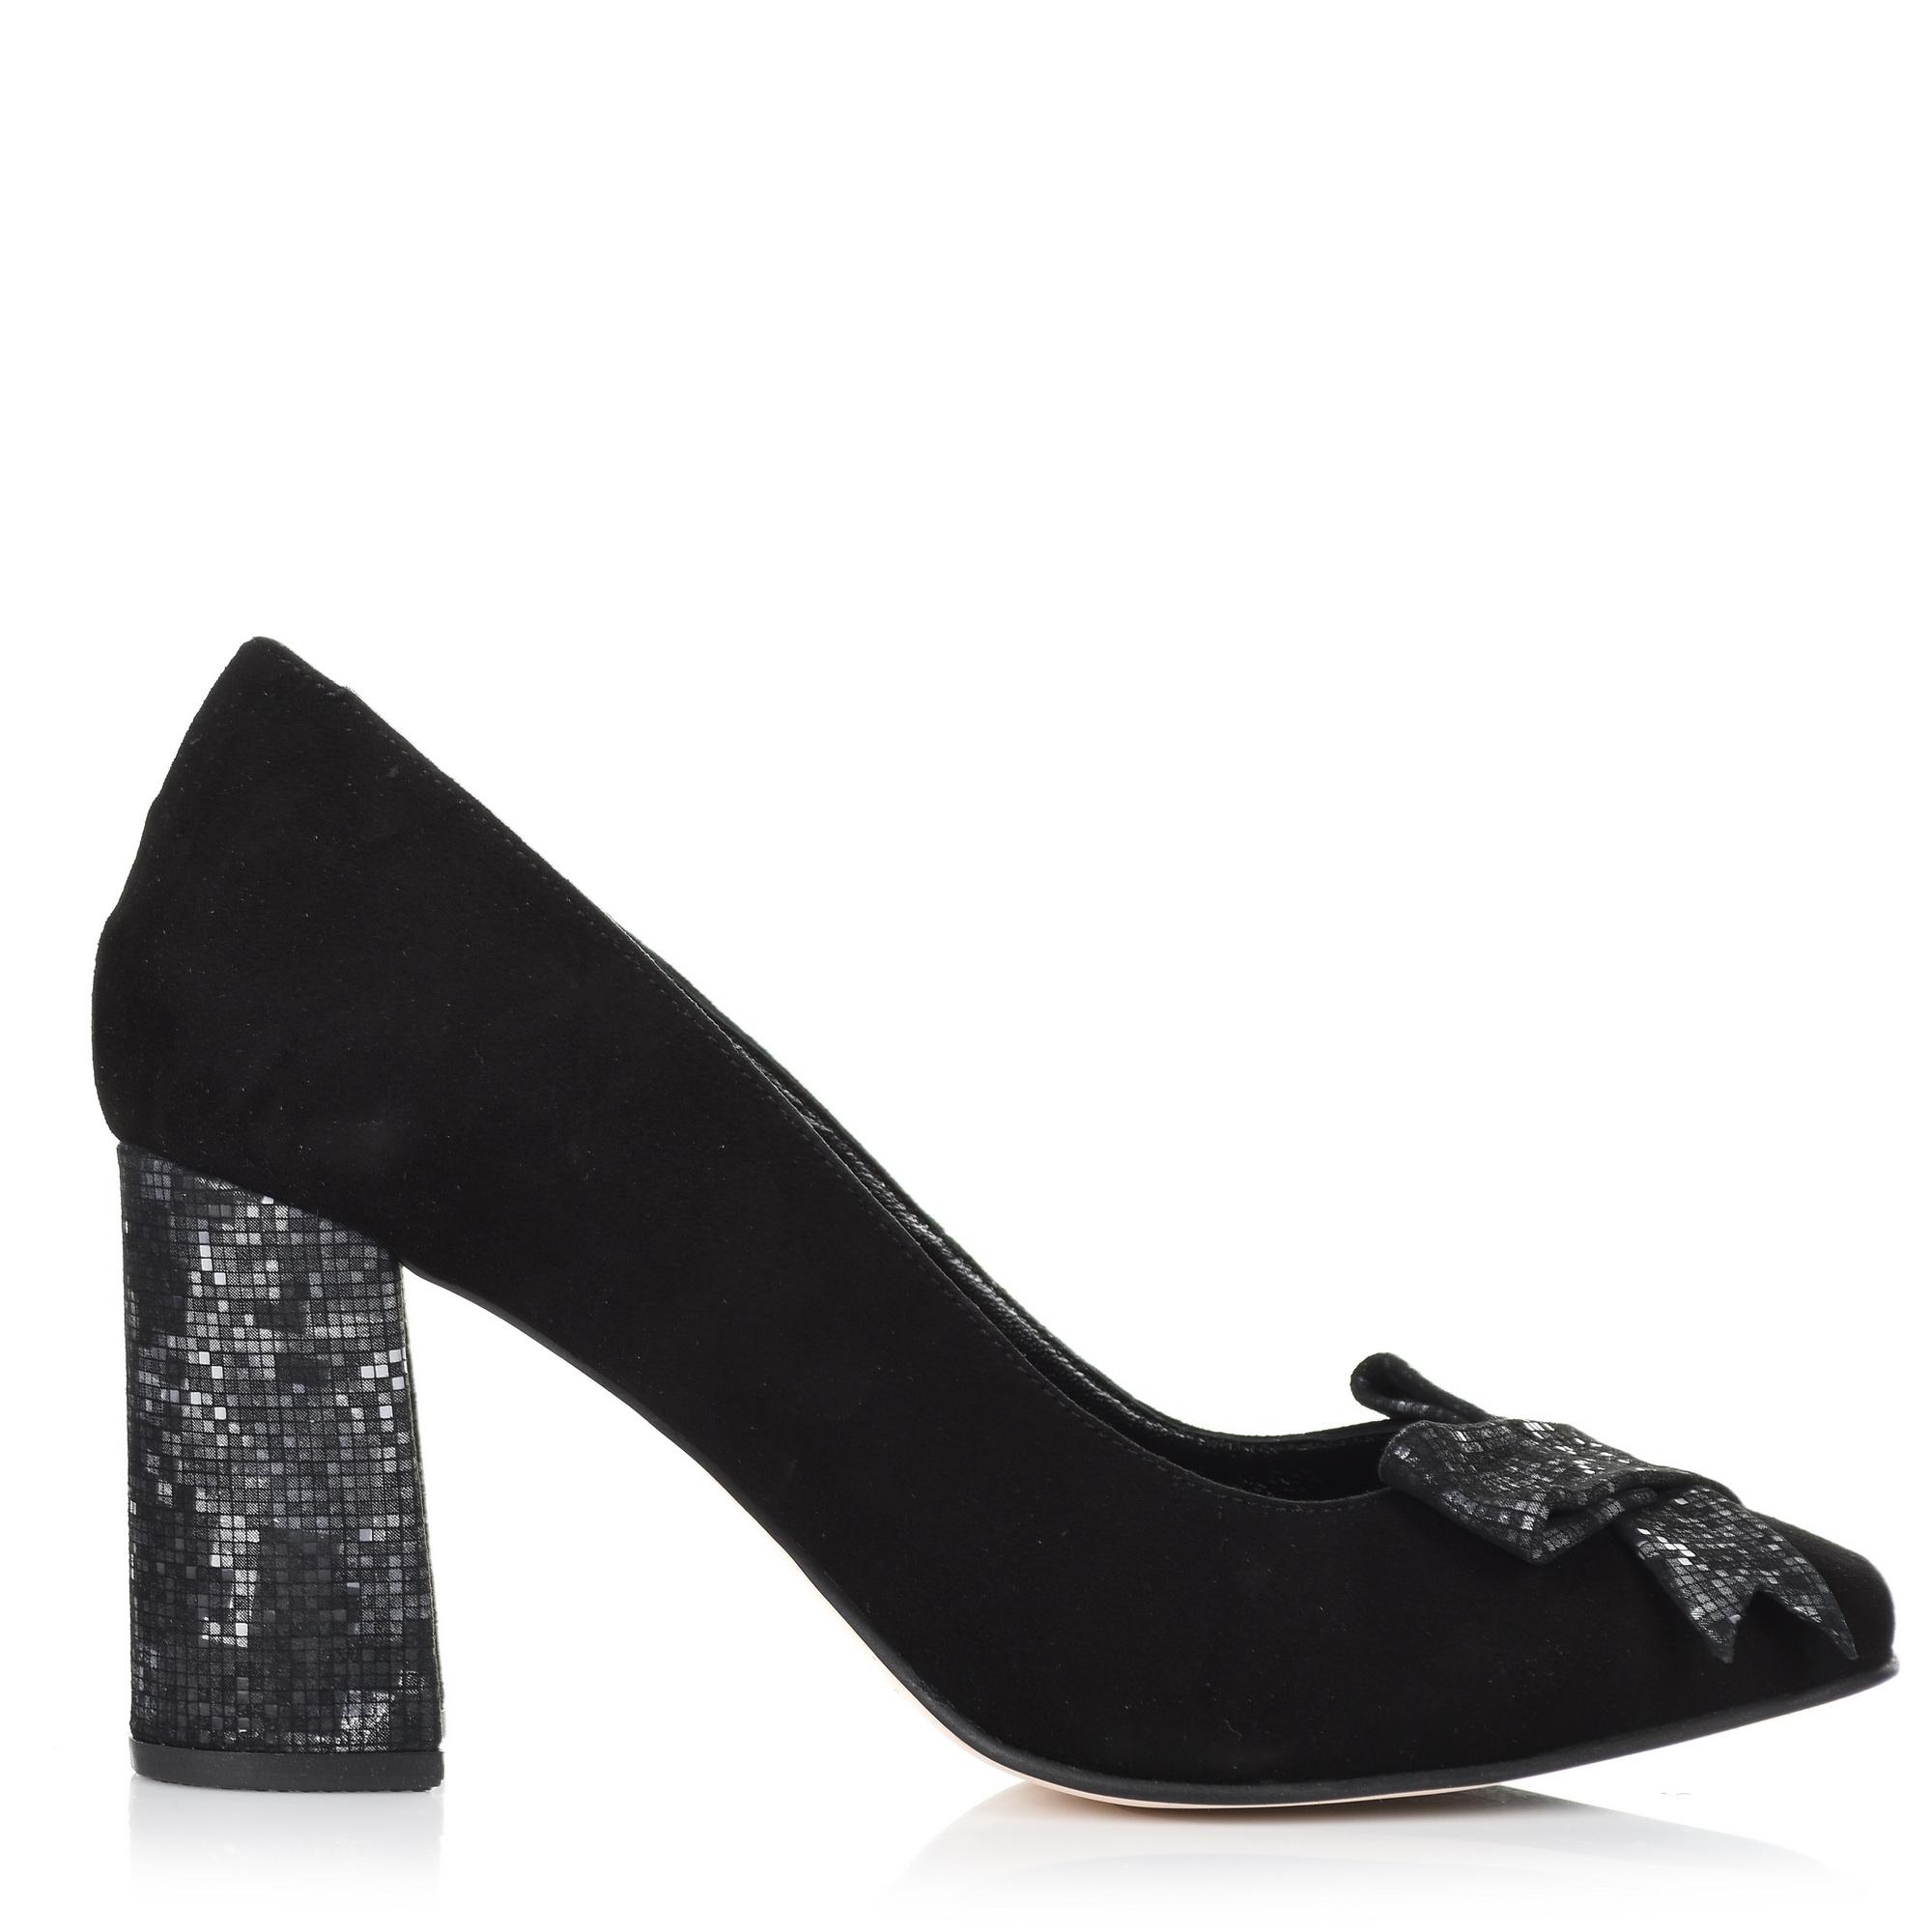 Suede Δερμάτινες Γόβες Este 79753 γυναικα   γυναικείο παπούτσι